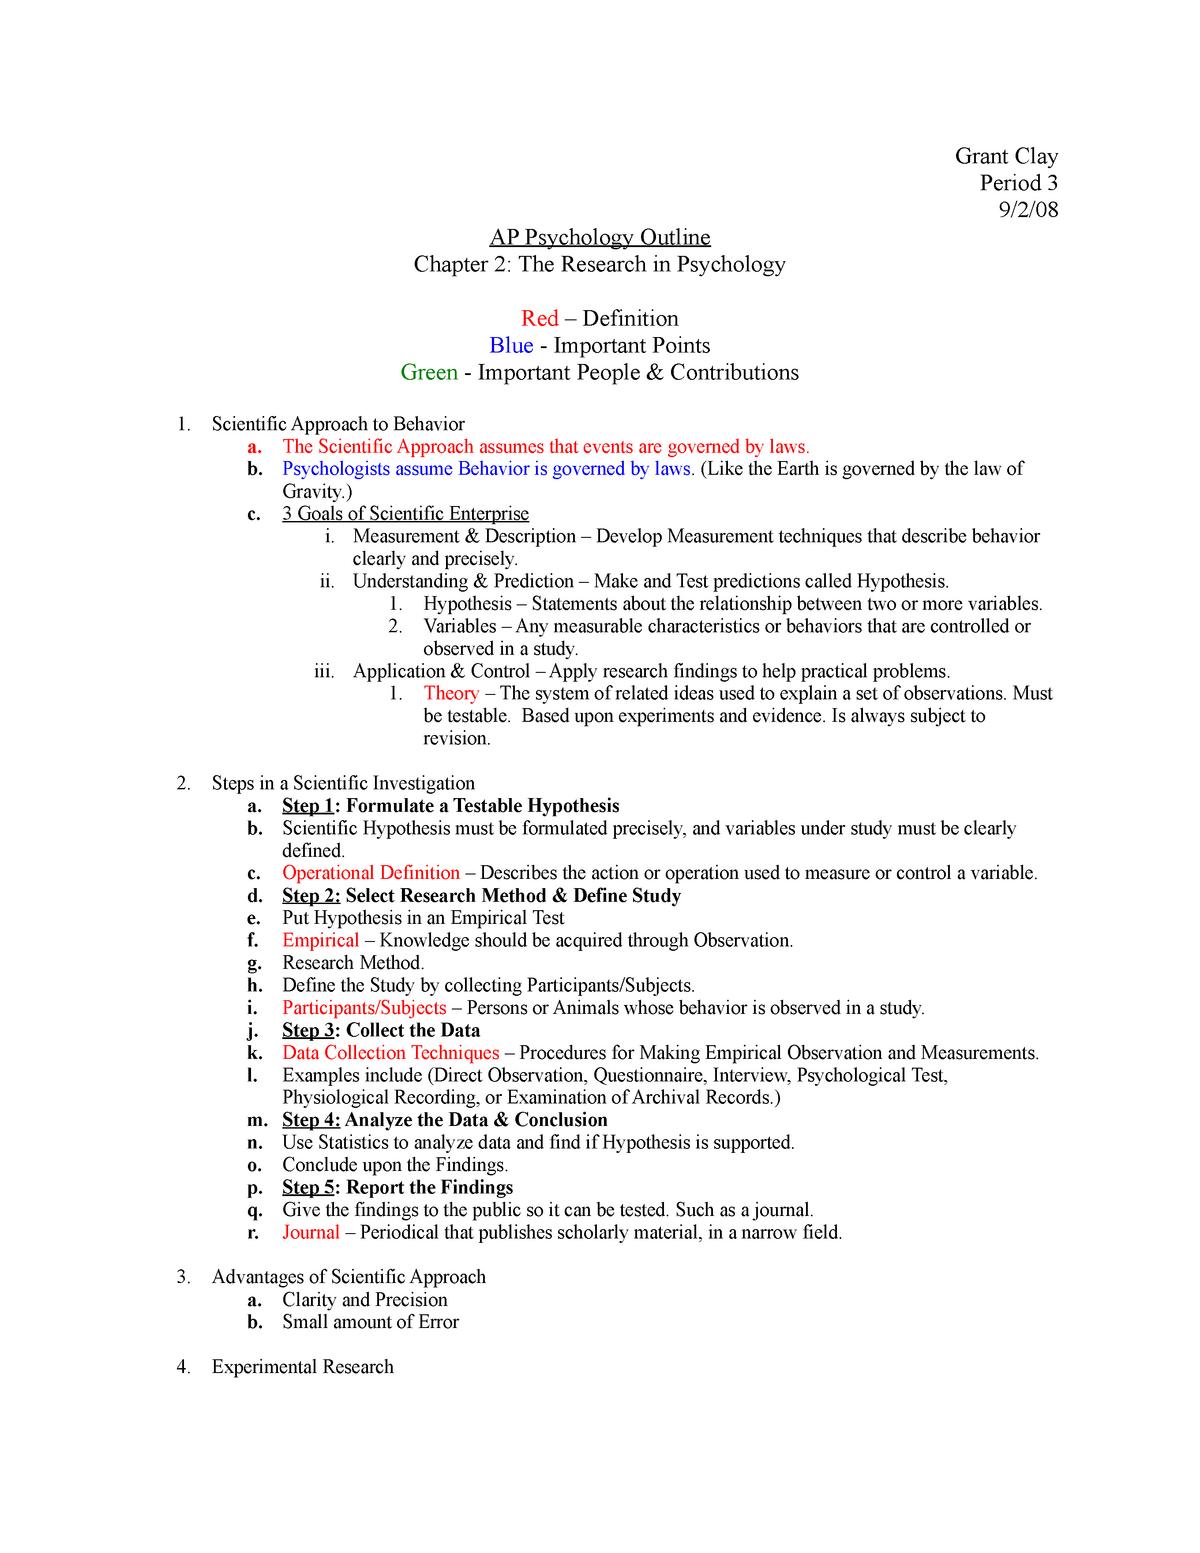 APP Ch 2 Outline - PSCH 312 Social Psychology - UIC - StuDocu